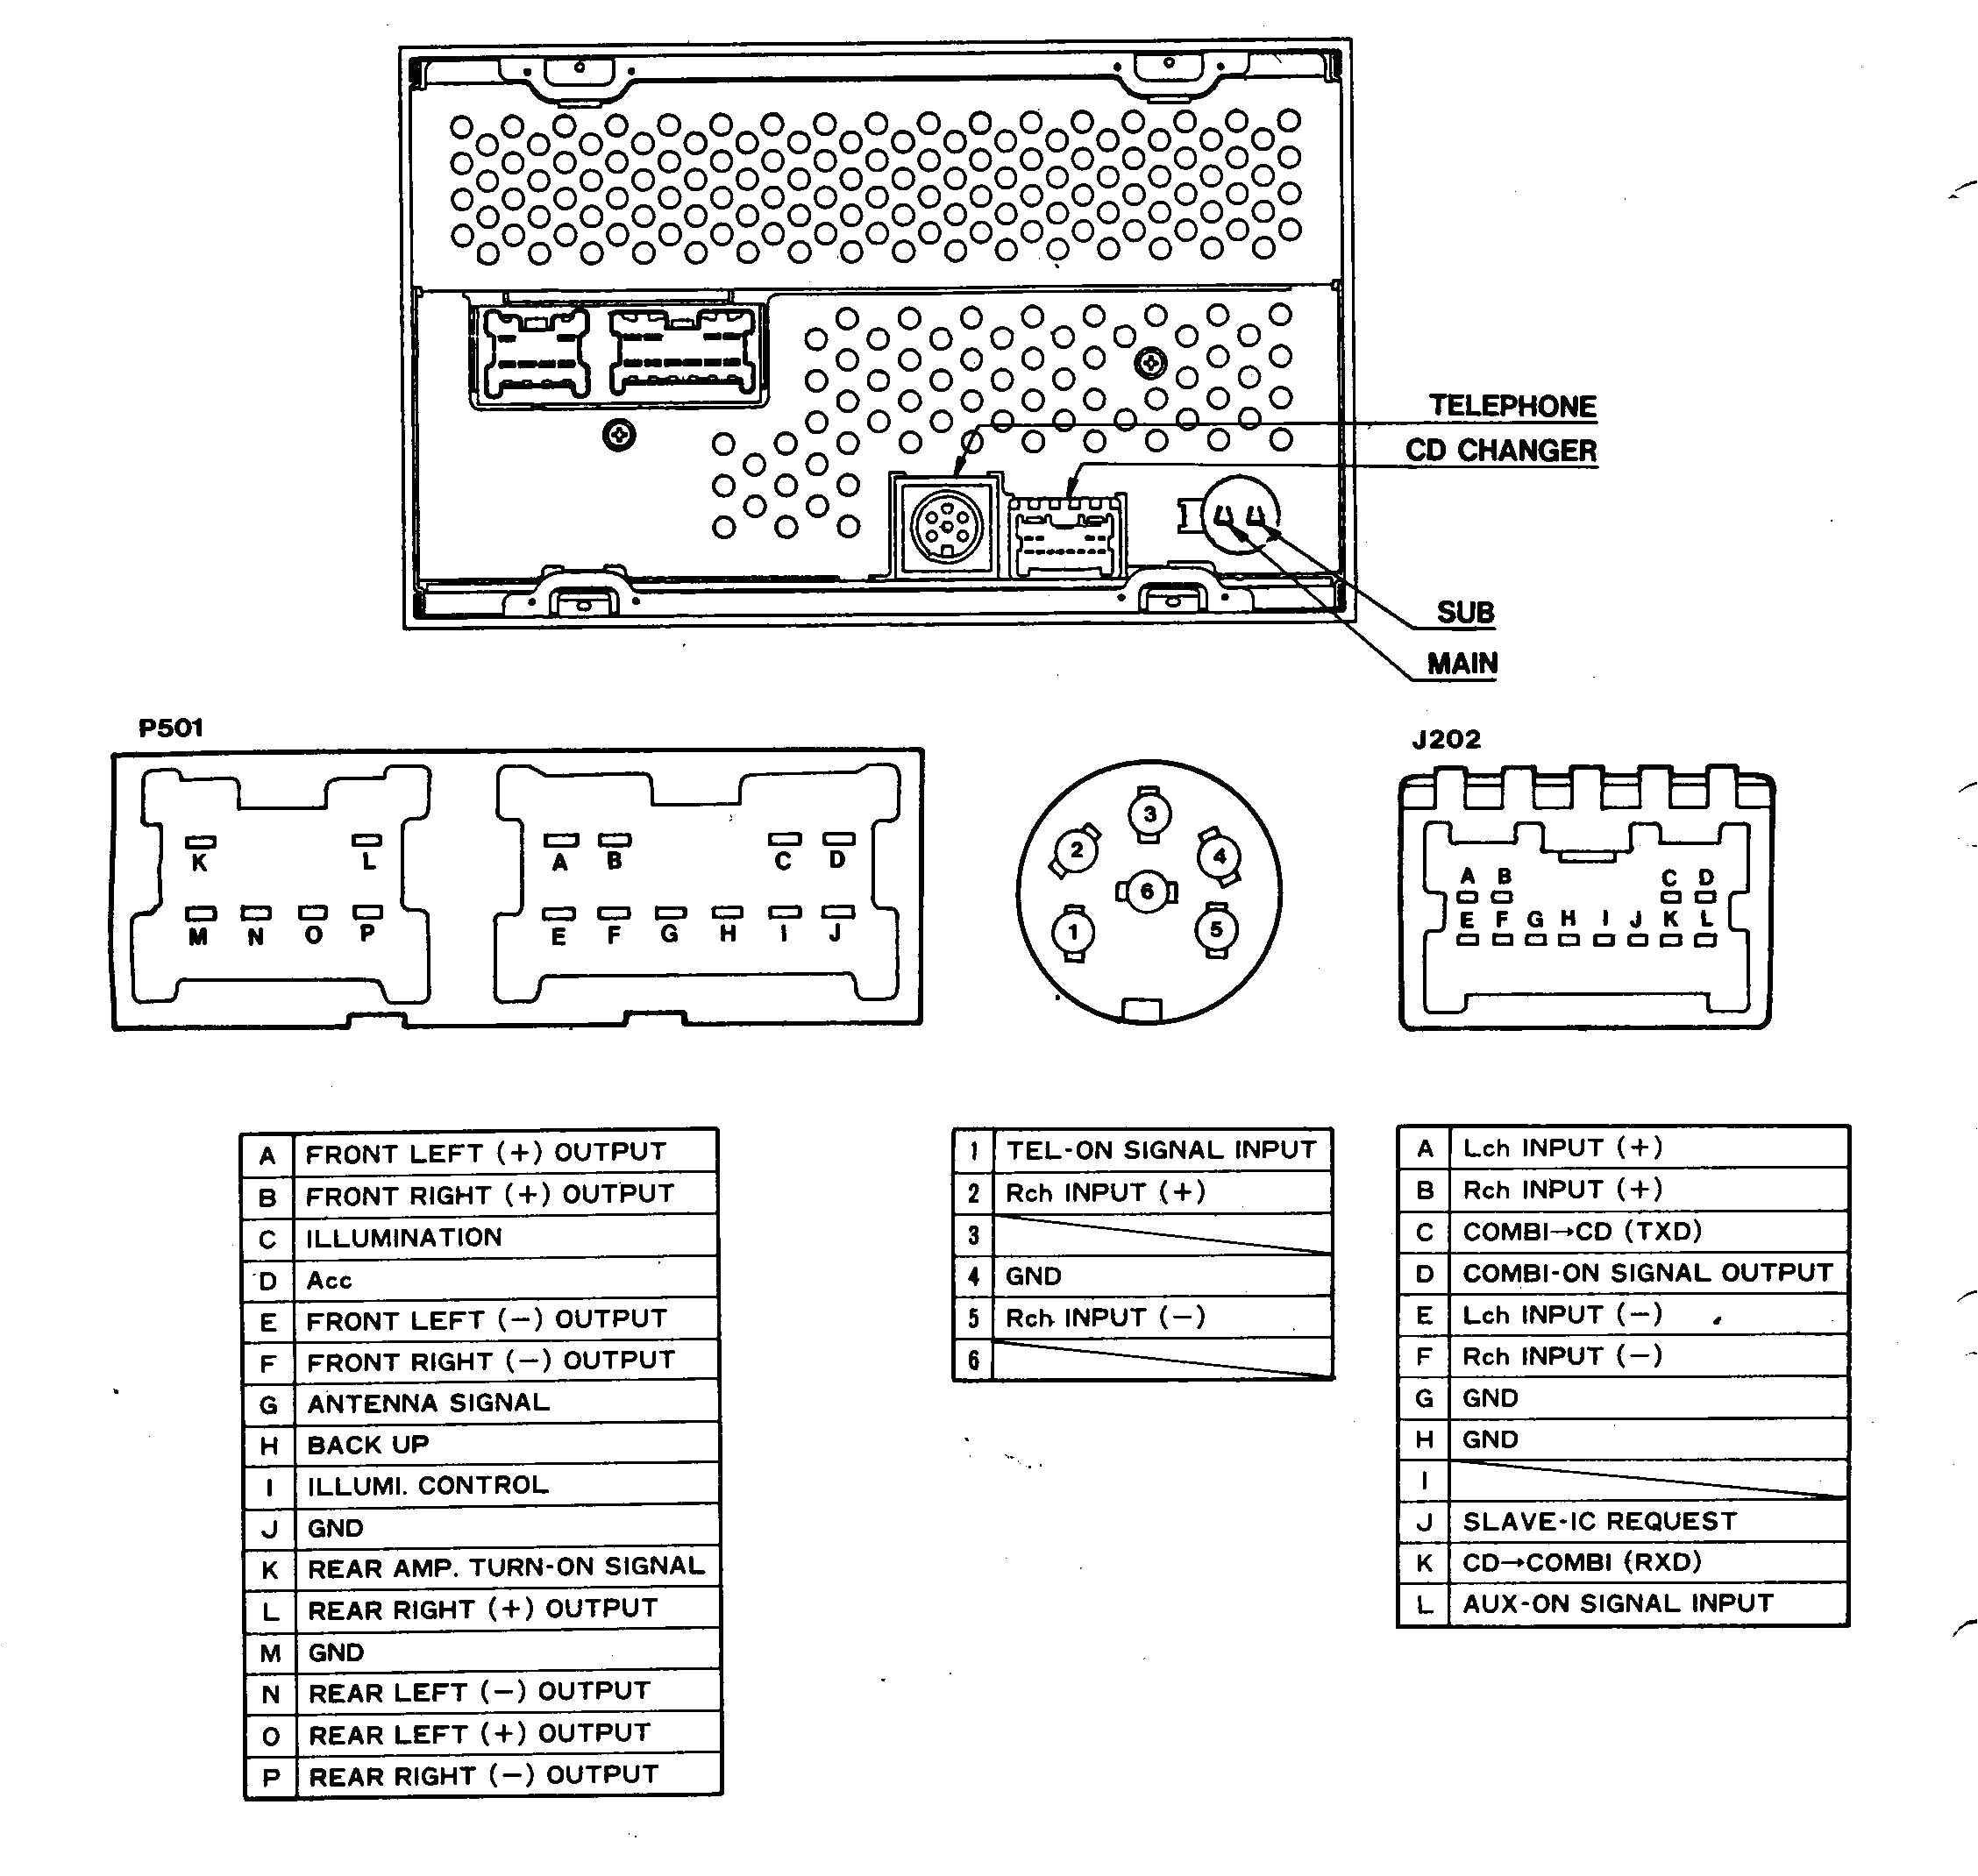 nissan maxima wiring harness wiring diagram schema 1991 nissan maxima radio harness